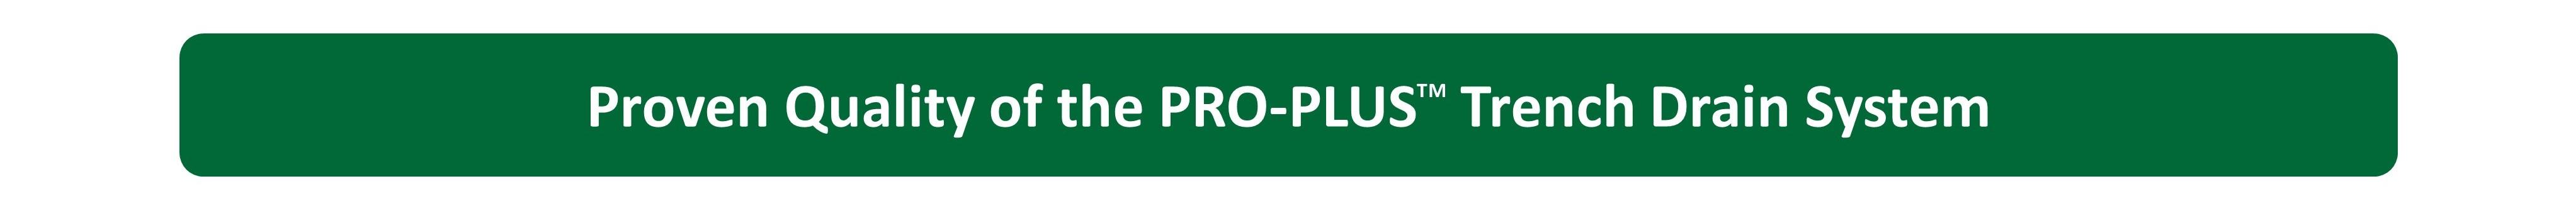 PRO-PLUS Proven Quality